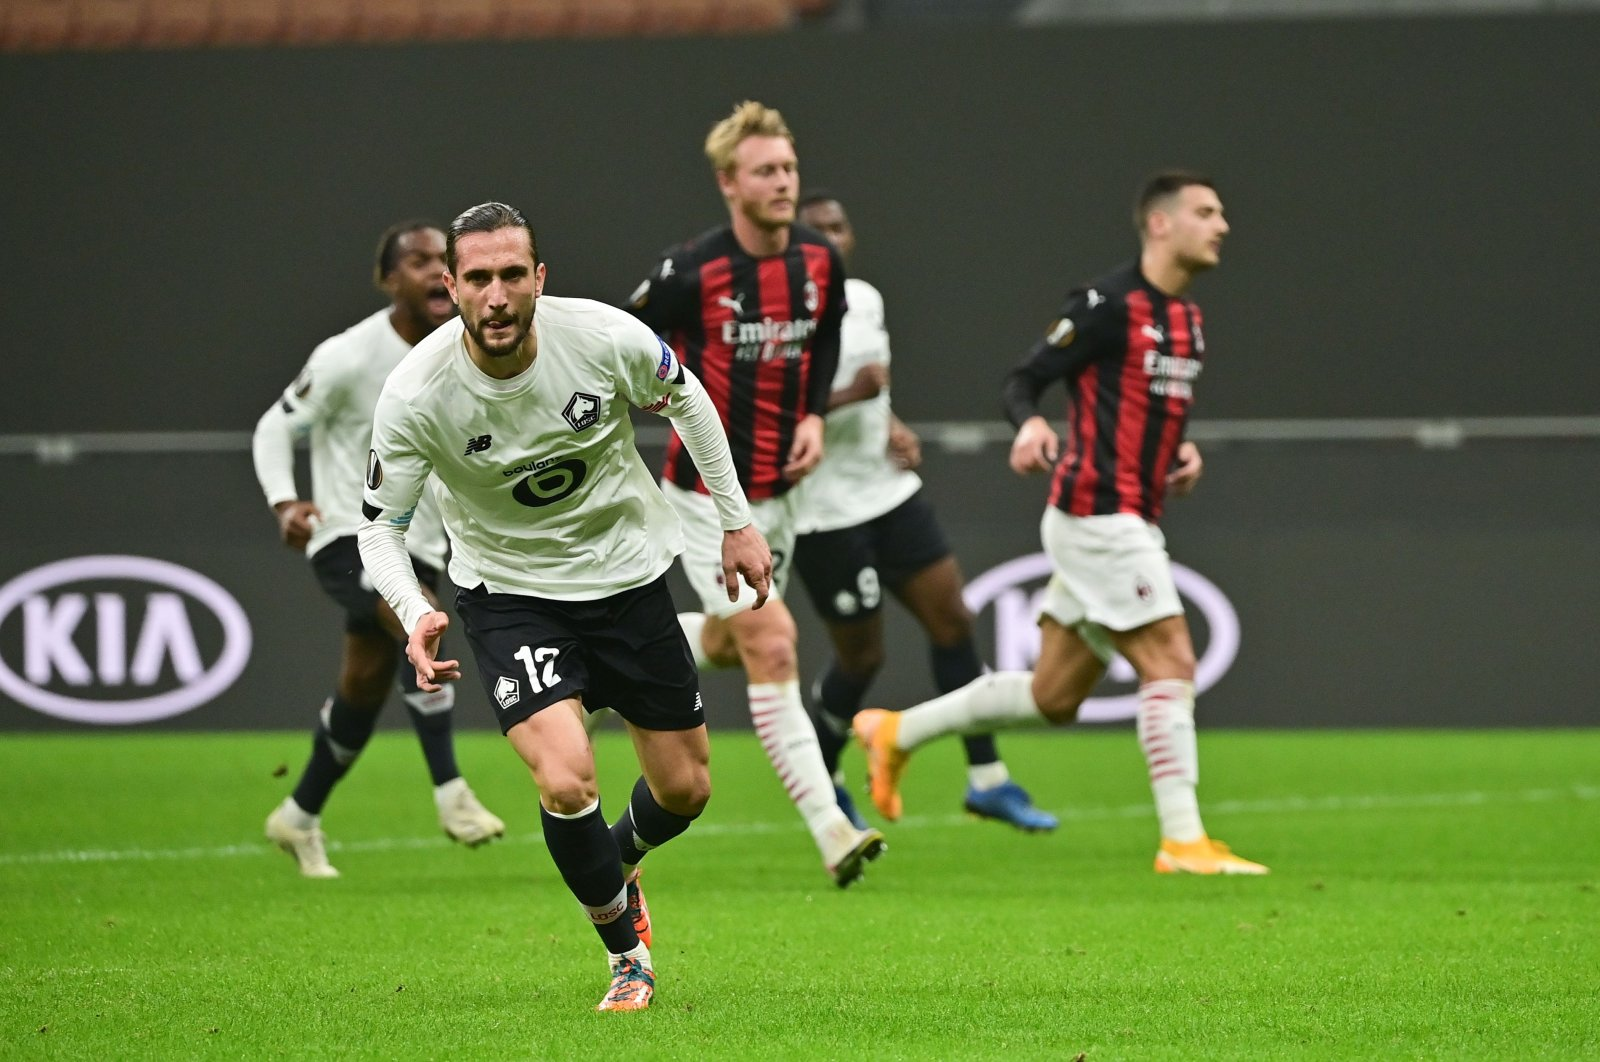 Lille's Yusuf Yazıcı celebrates a goal against AC Milan during the UEFA Europa League match, in Milan, Italy, Nov. 5, 2020. (AFP Photo)